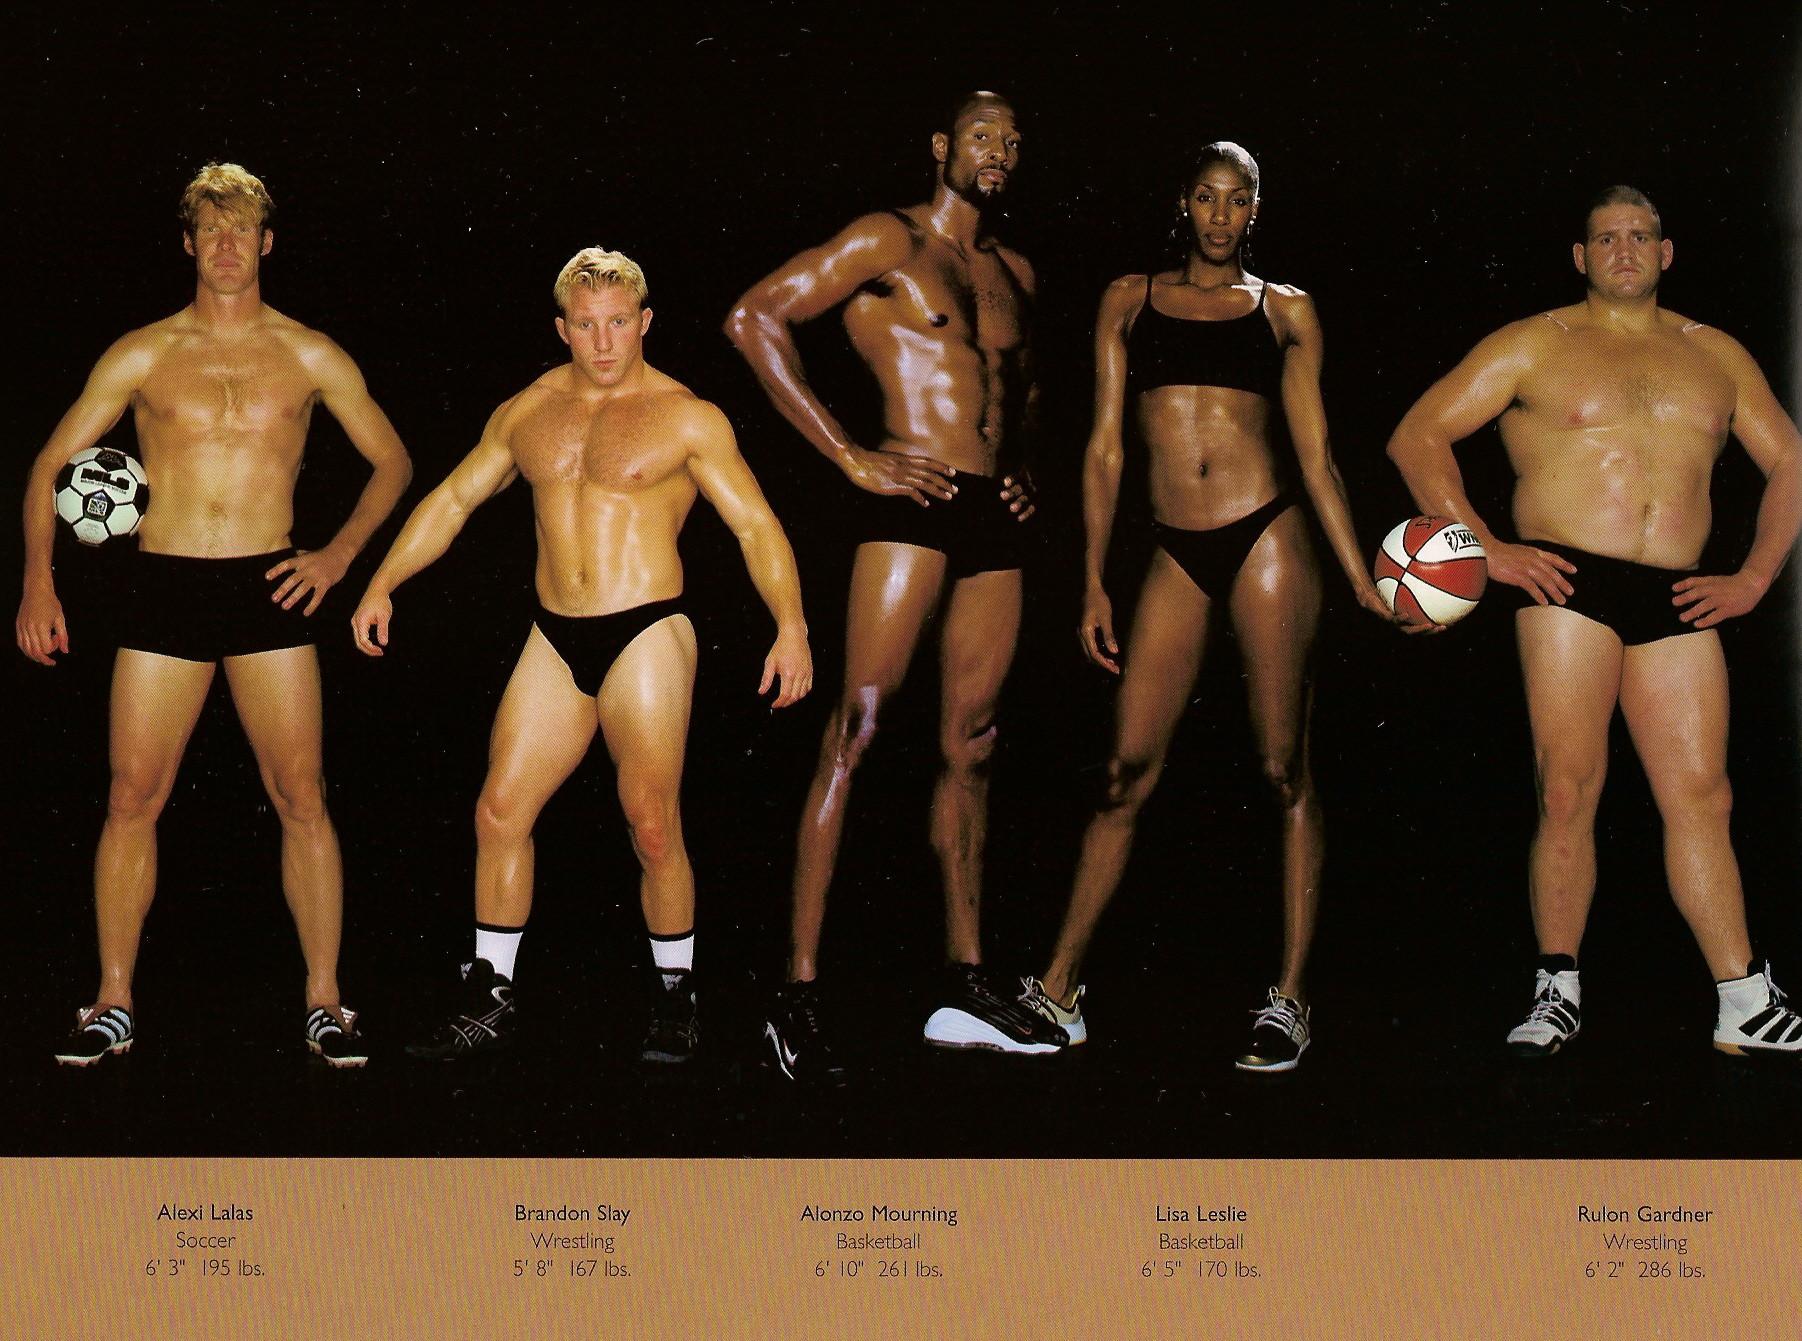 Howard Schatz / слева направо: футбол, реслинг, баскетбол, тоже баскетбол, реслинг.